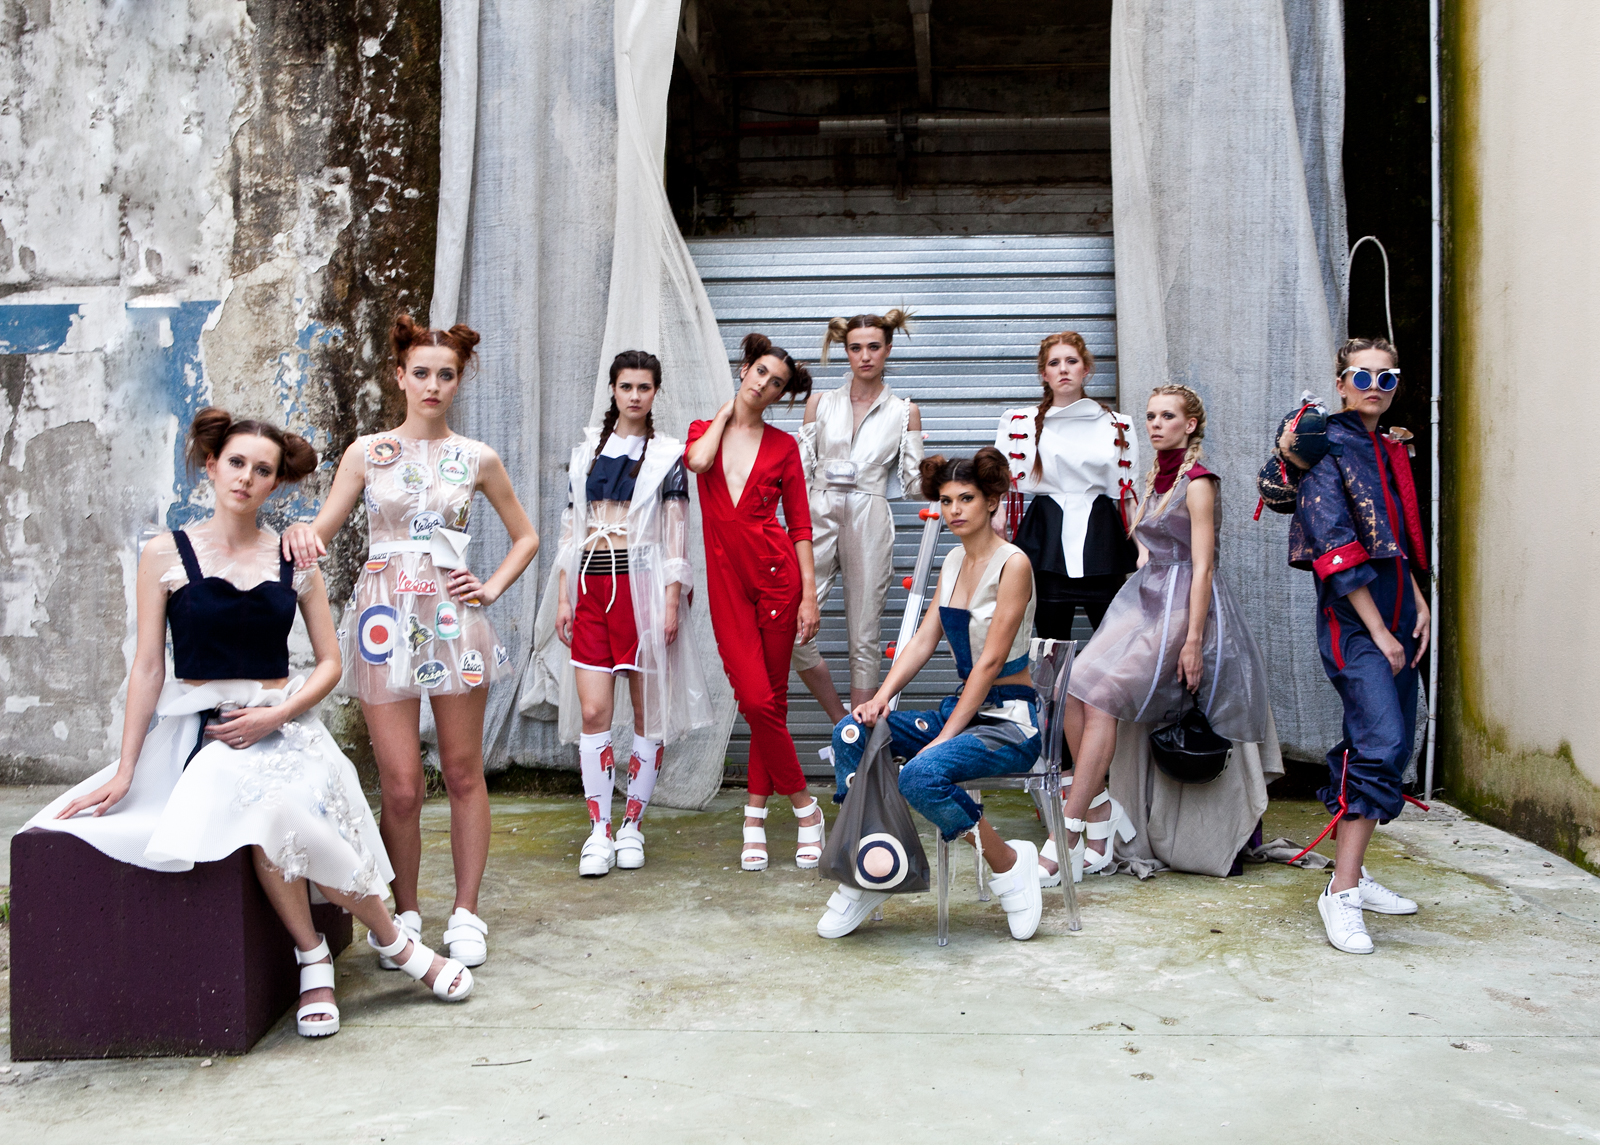 Modartech Meeting: Fashion Photography - April 24th